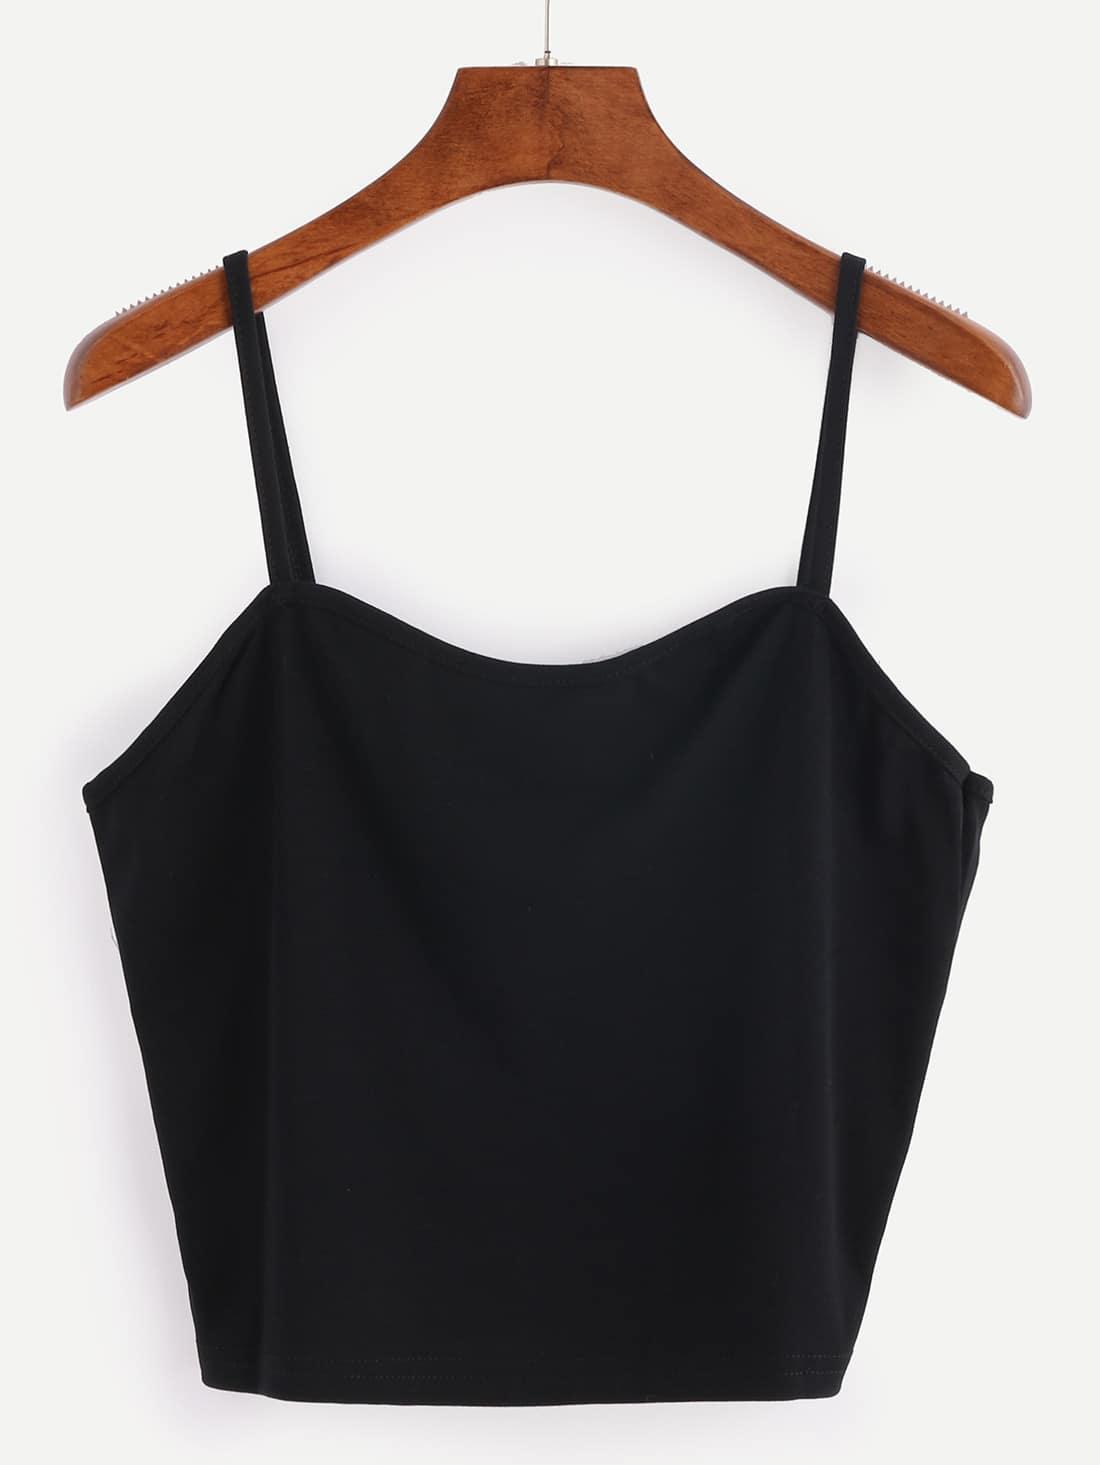 Binding Crop Cami Top - Black